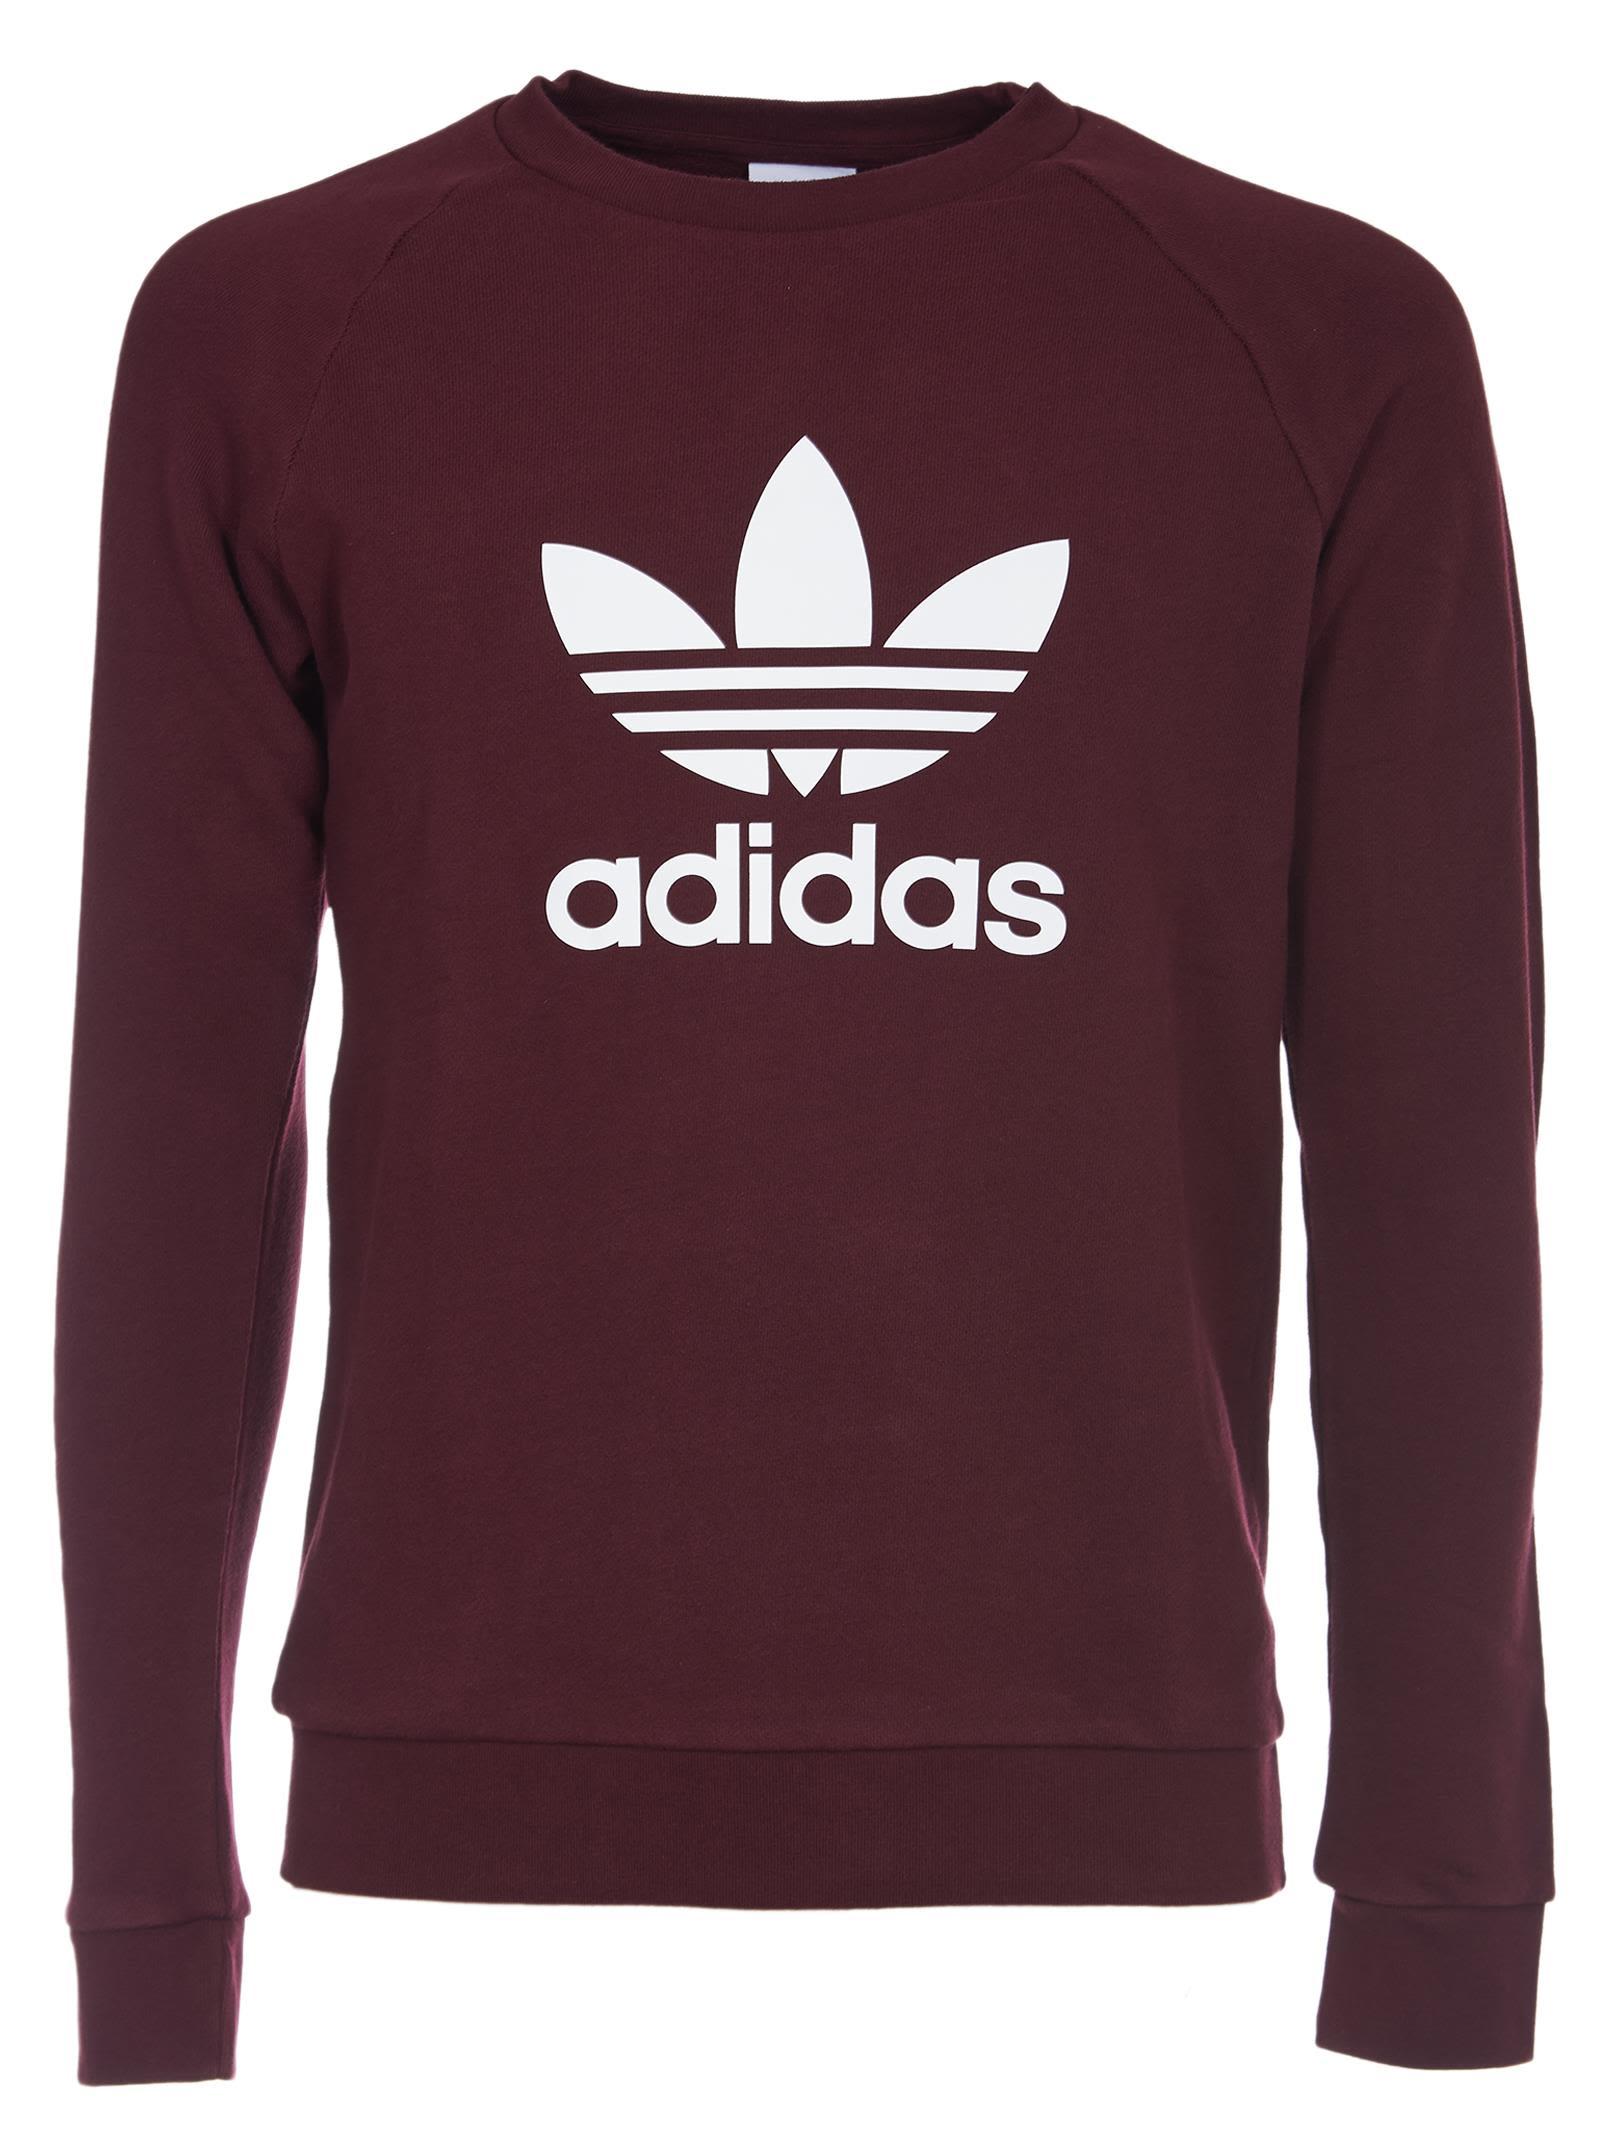 Adidas Originals Logo Sweatshirt